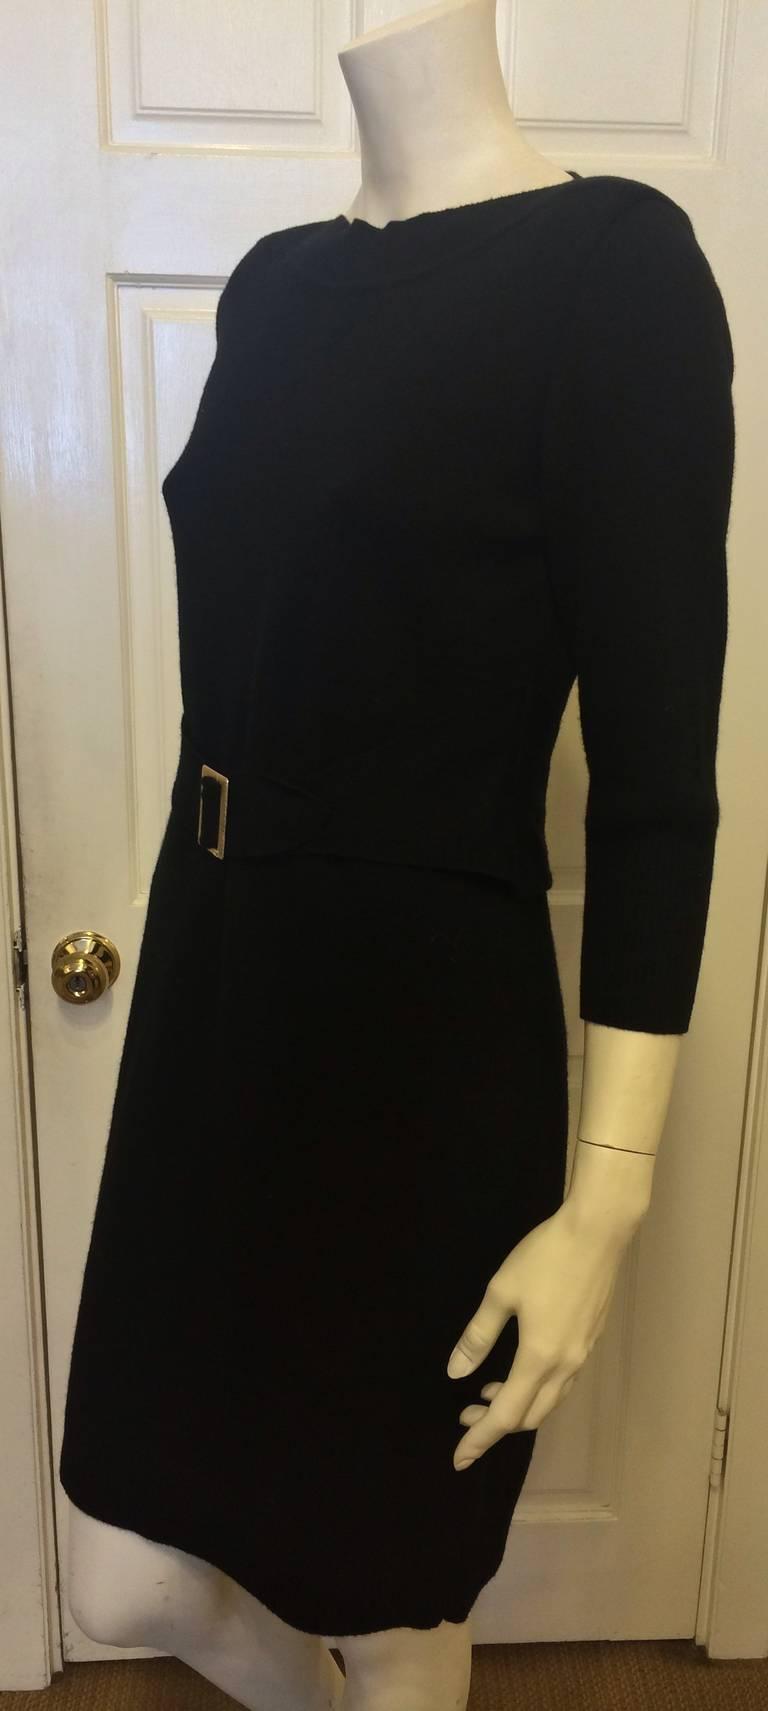 chanel black knit dress with gold belt at 1stdibs